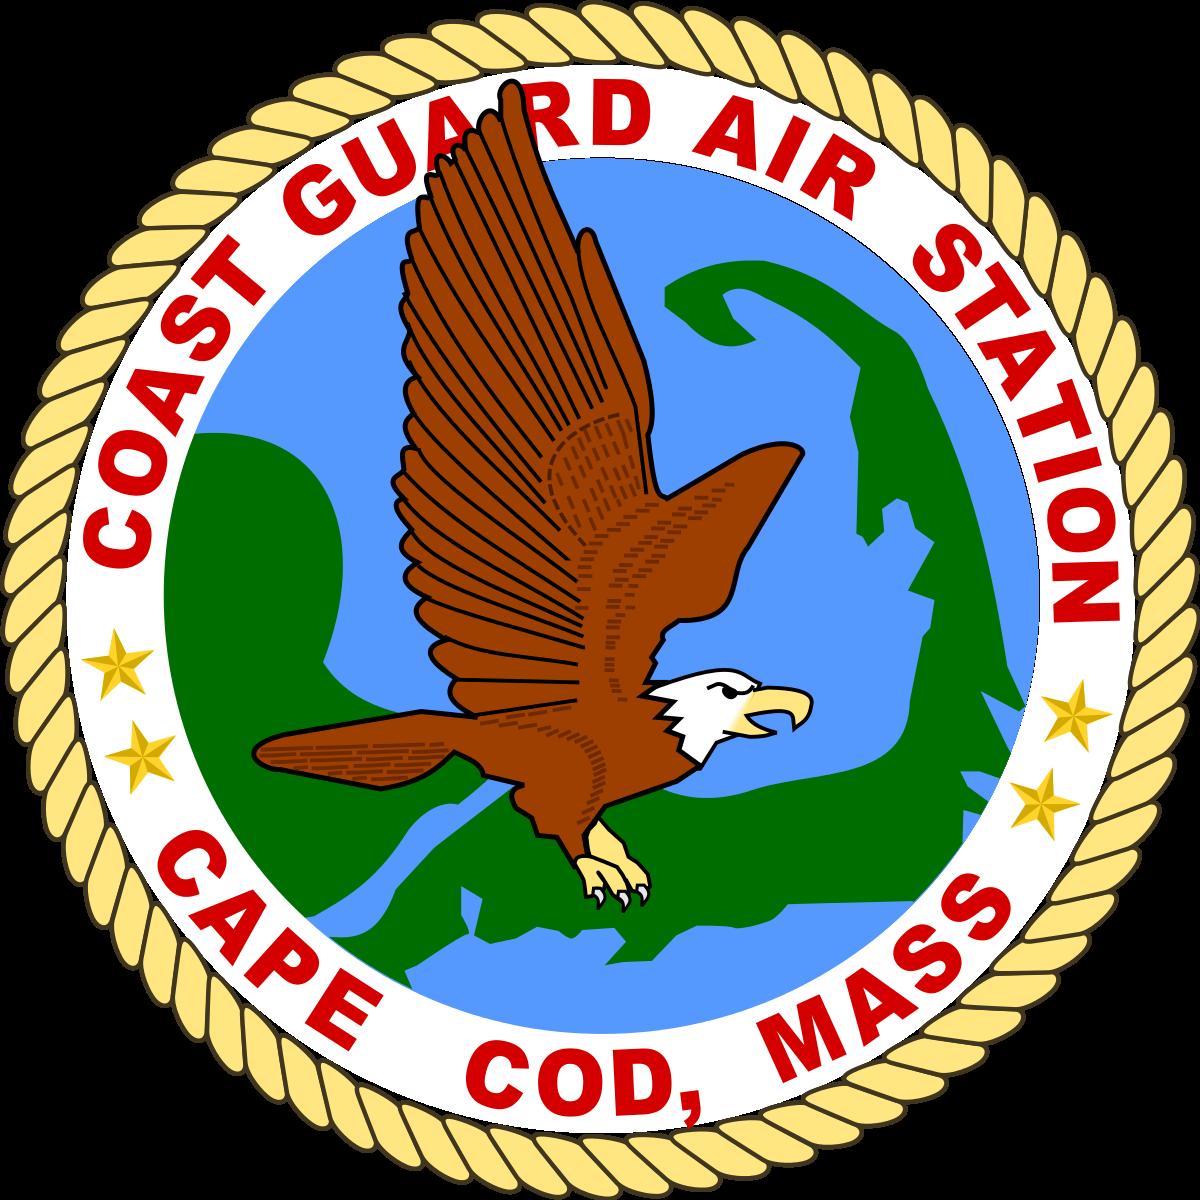 Sailor clipart uniform coast guard. Air station cape cod